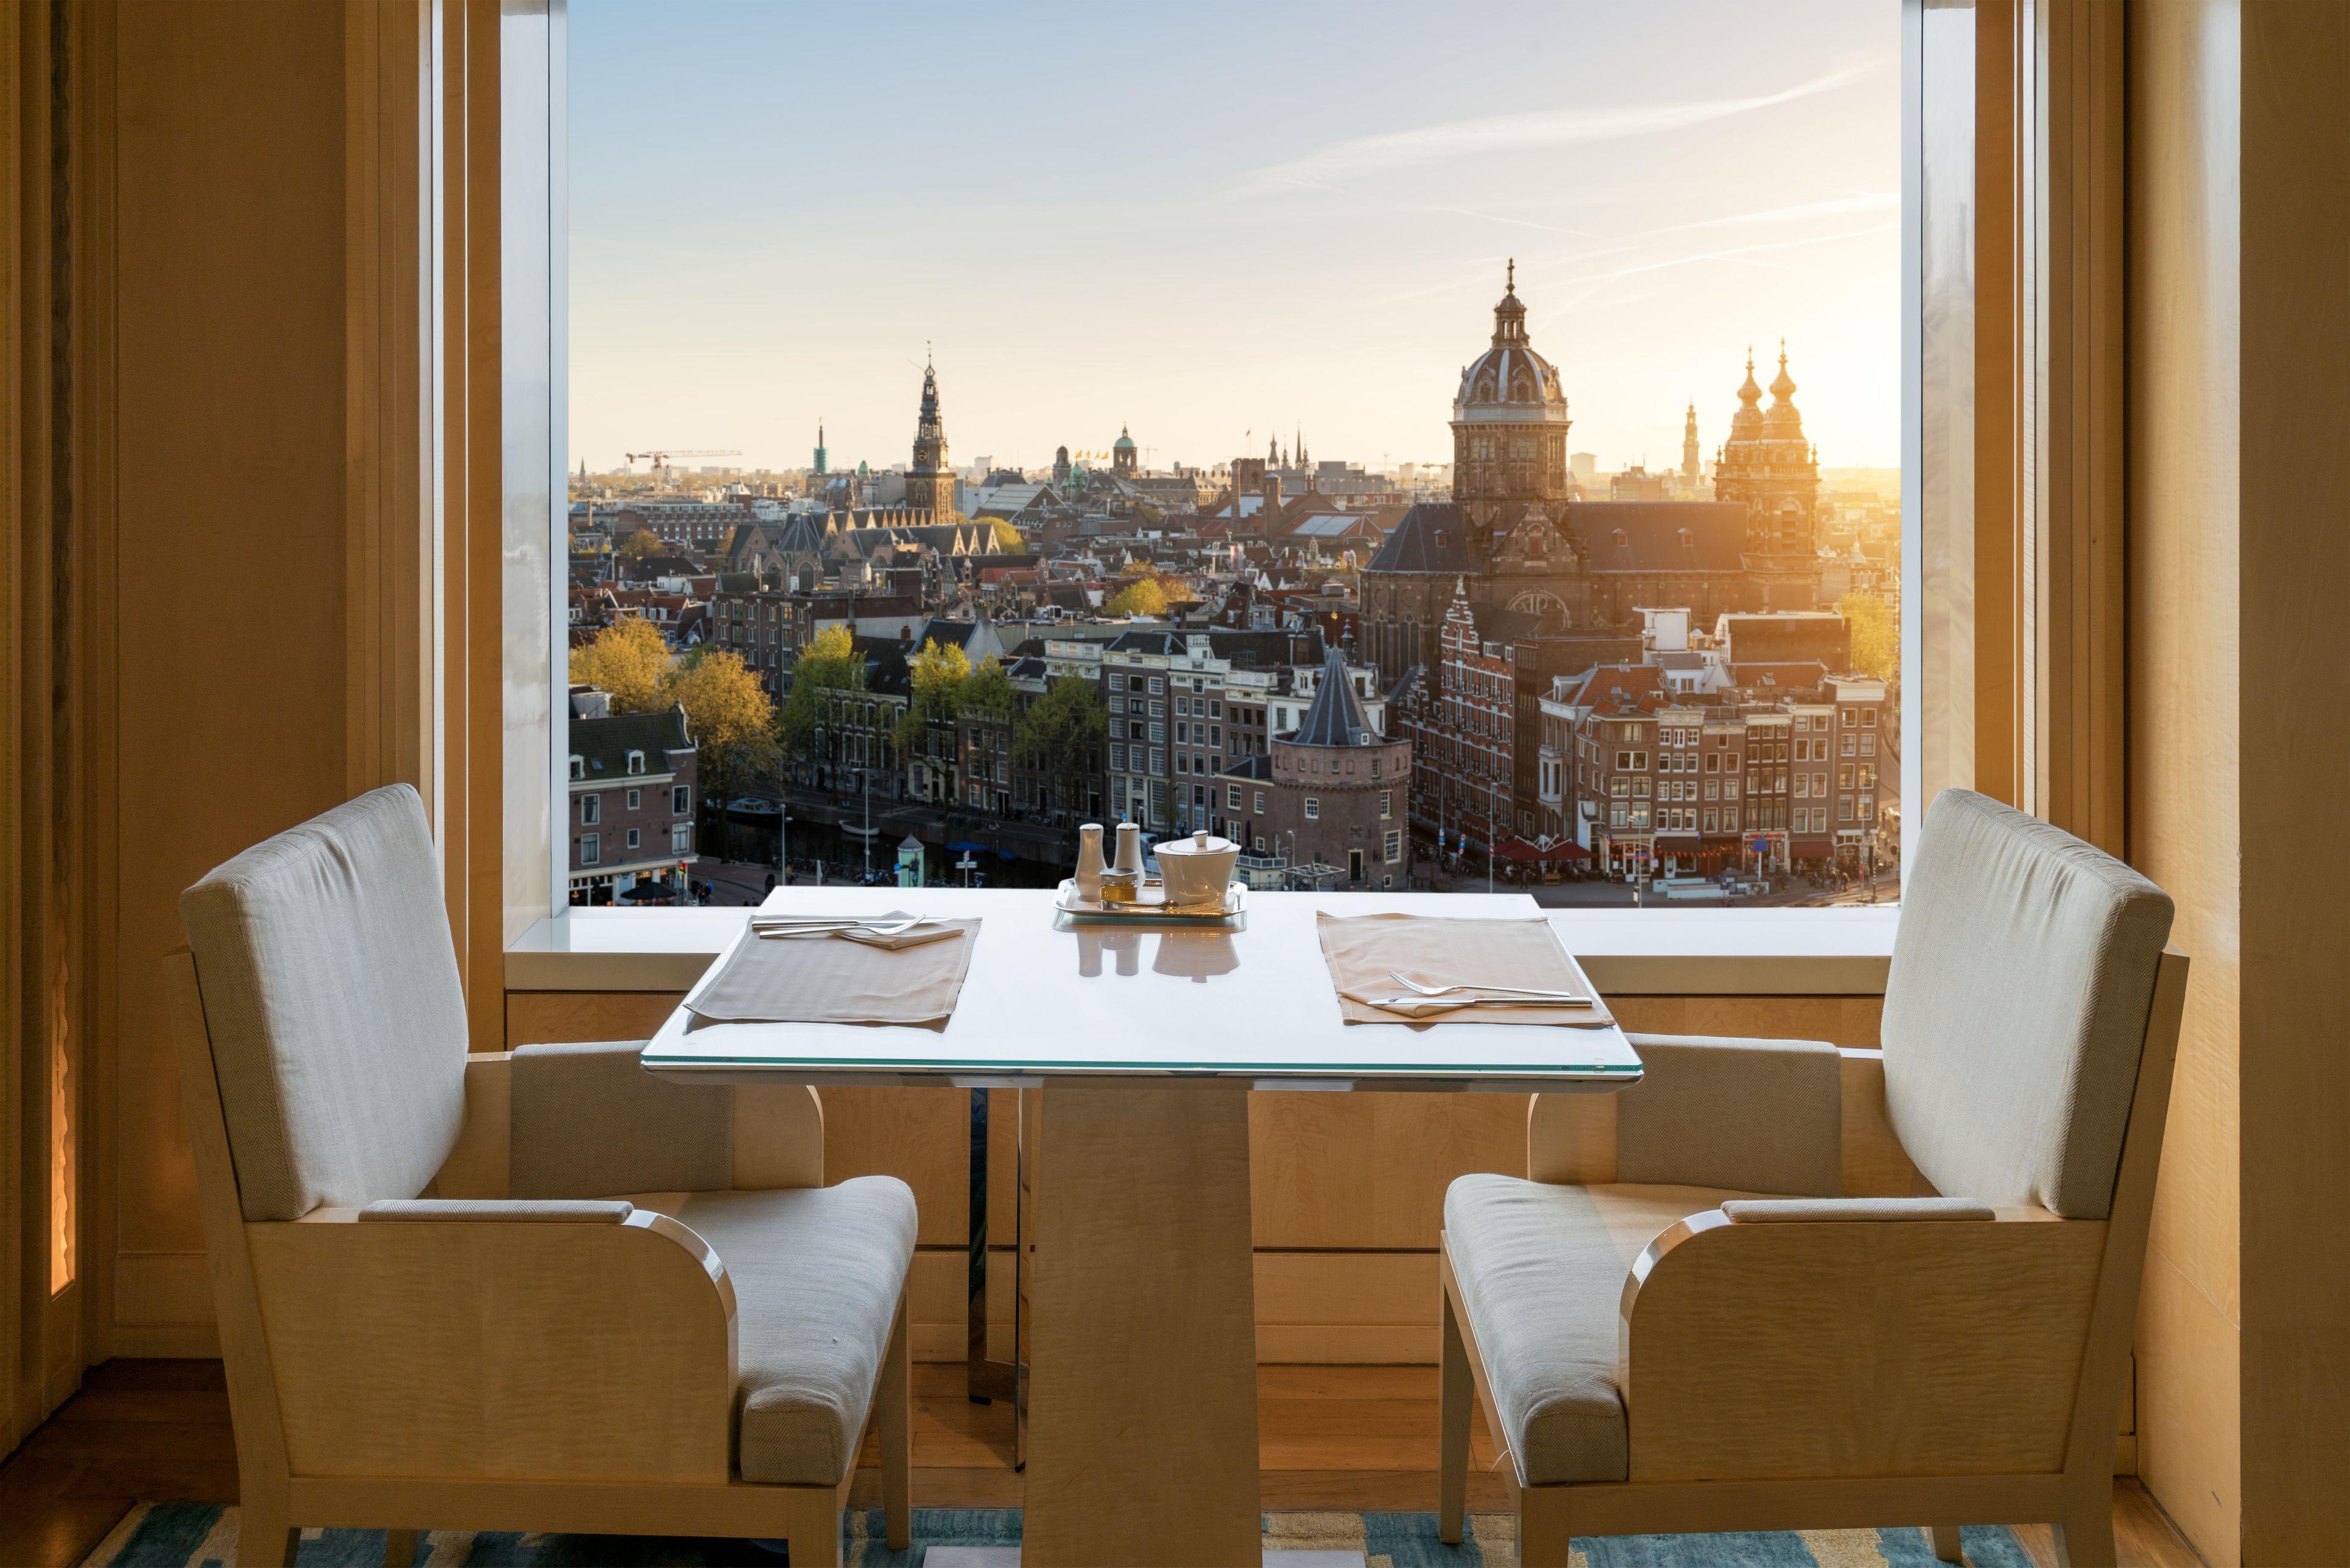 Ristoranti Su Torri E Terrazze Gourmet In Olanda Si Mangia